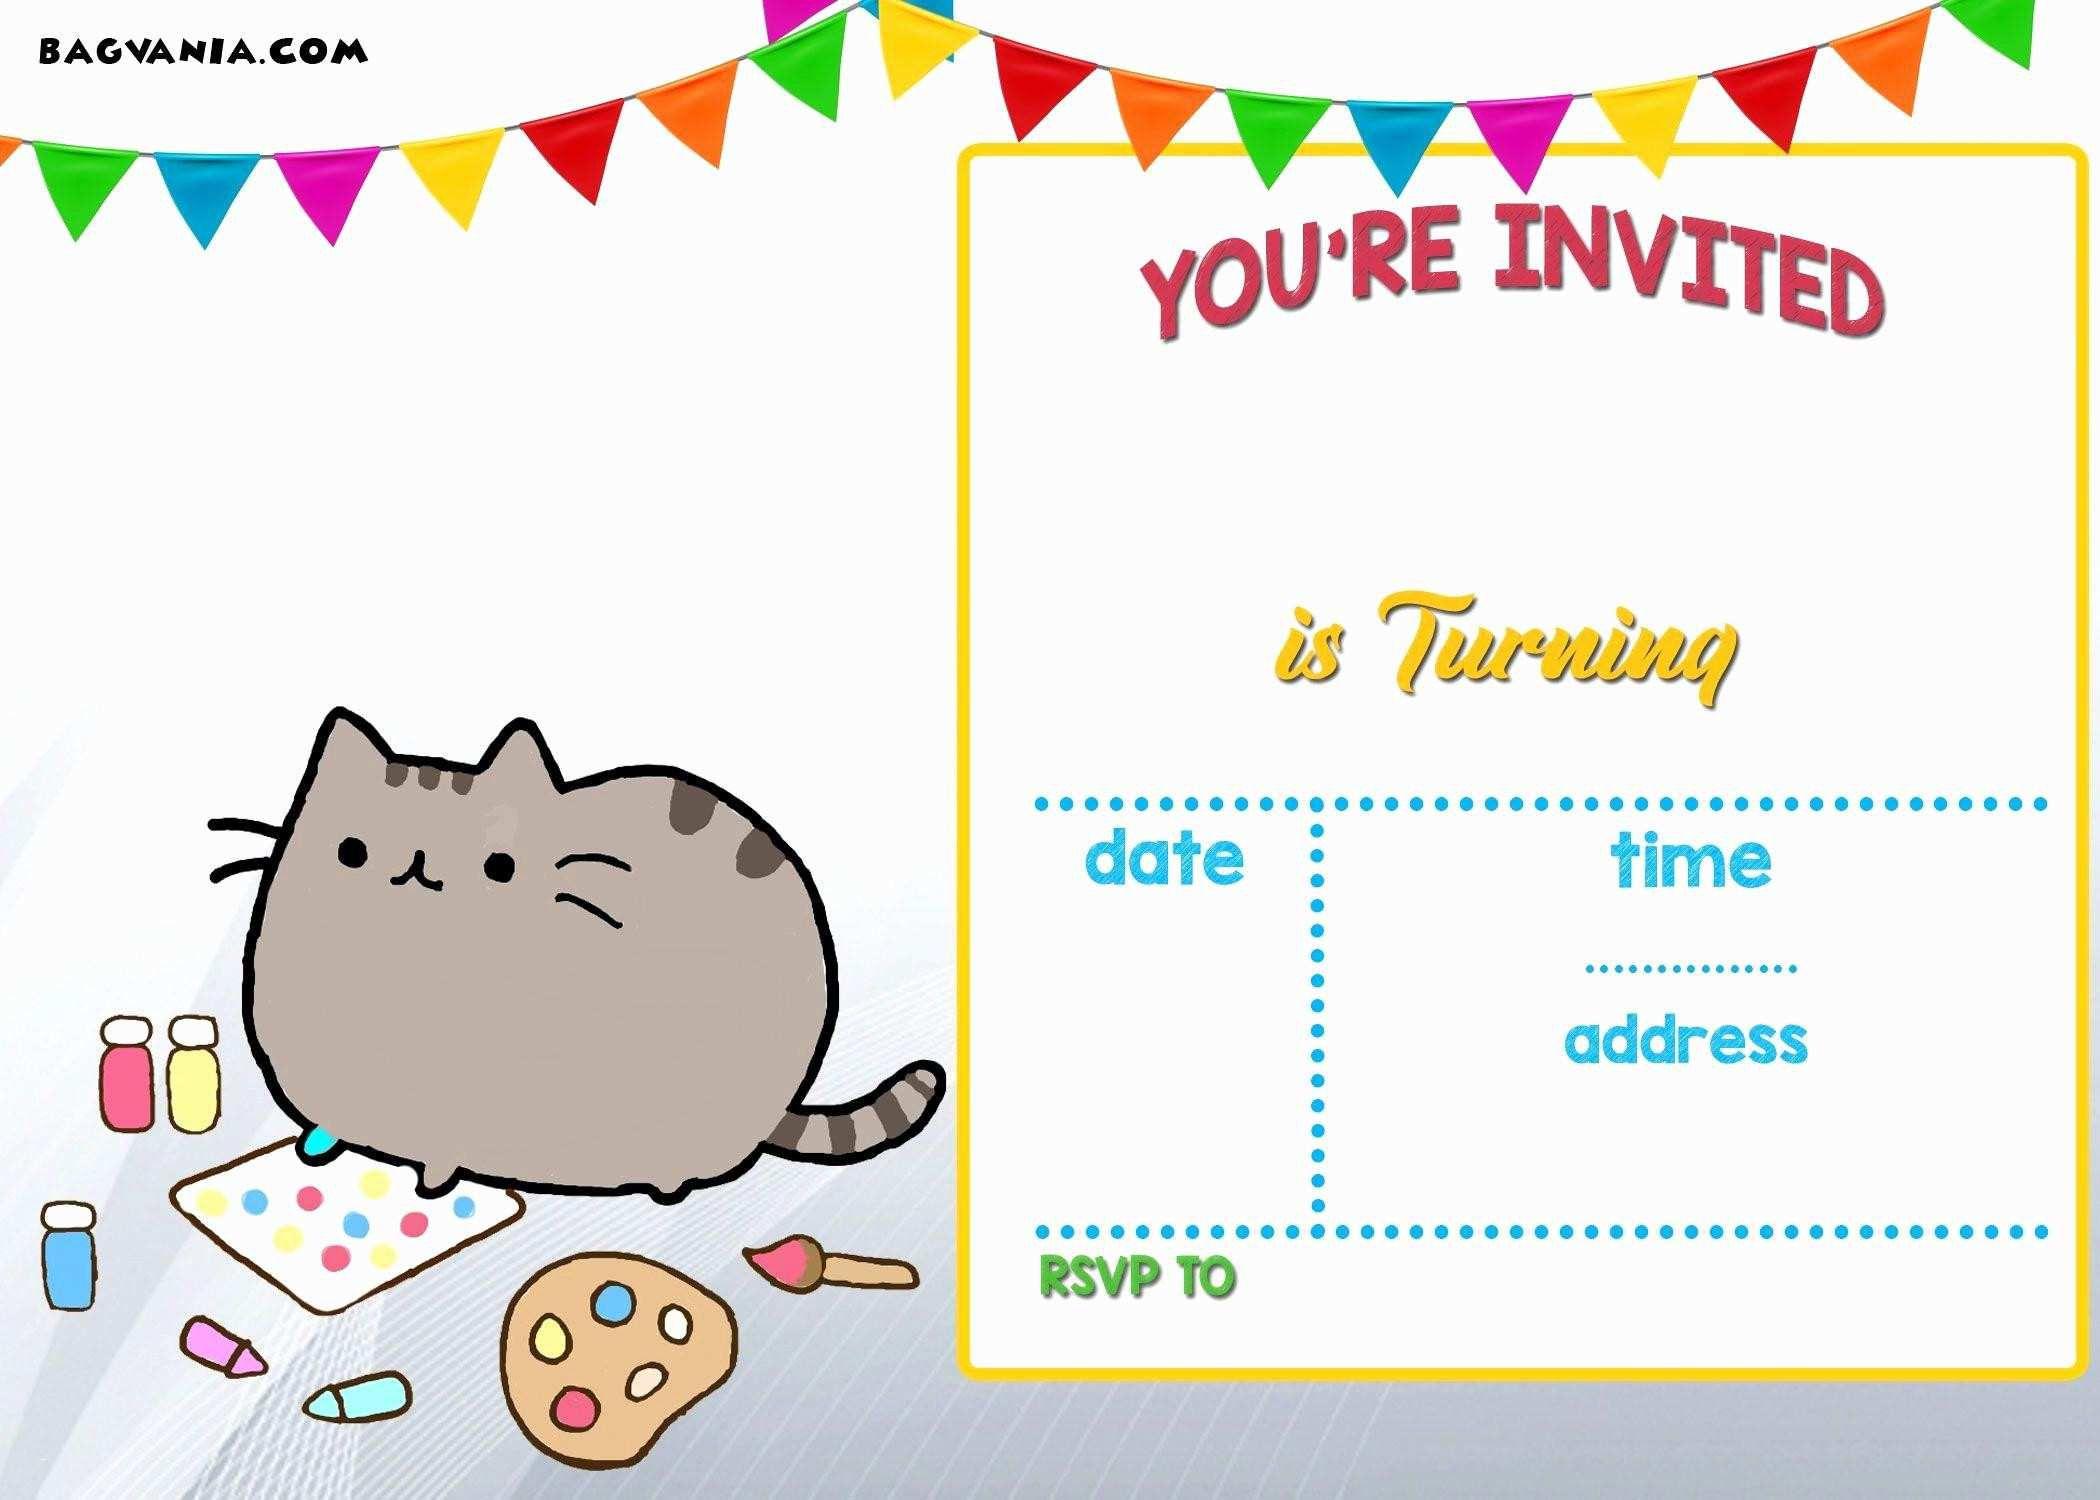 004 Shocking Invitation Template Free Printable Example  Editable Christma Party Dinner RetirementFull